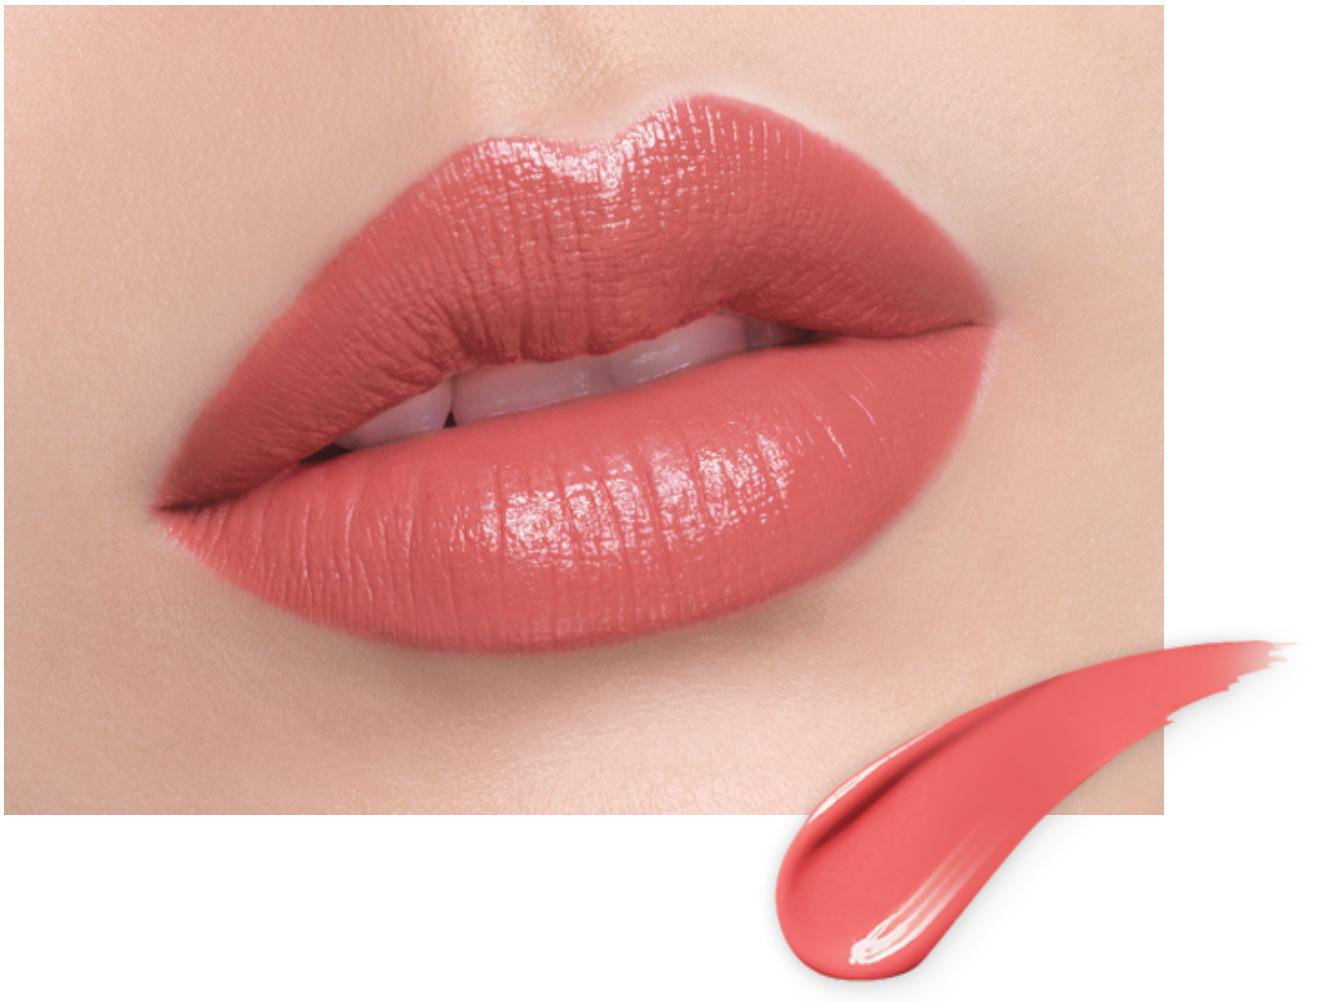 laneige-silk-intense-lipstick-214.png